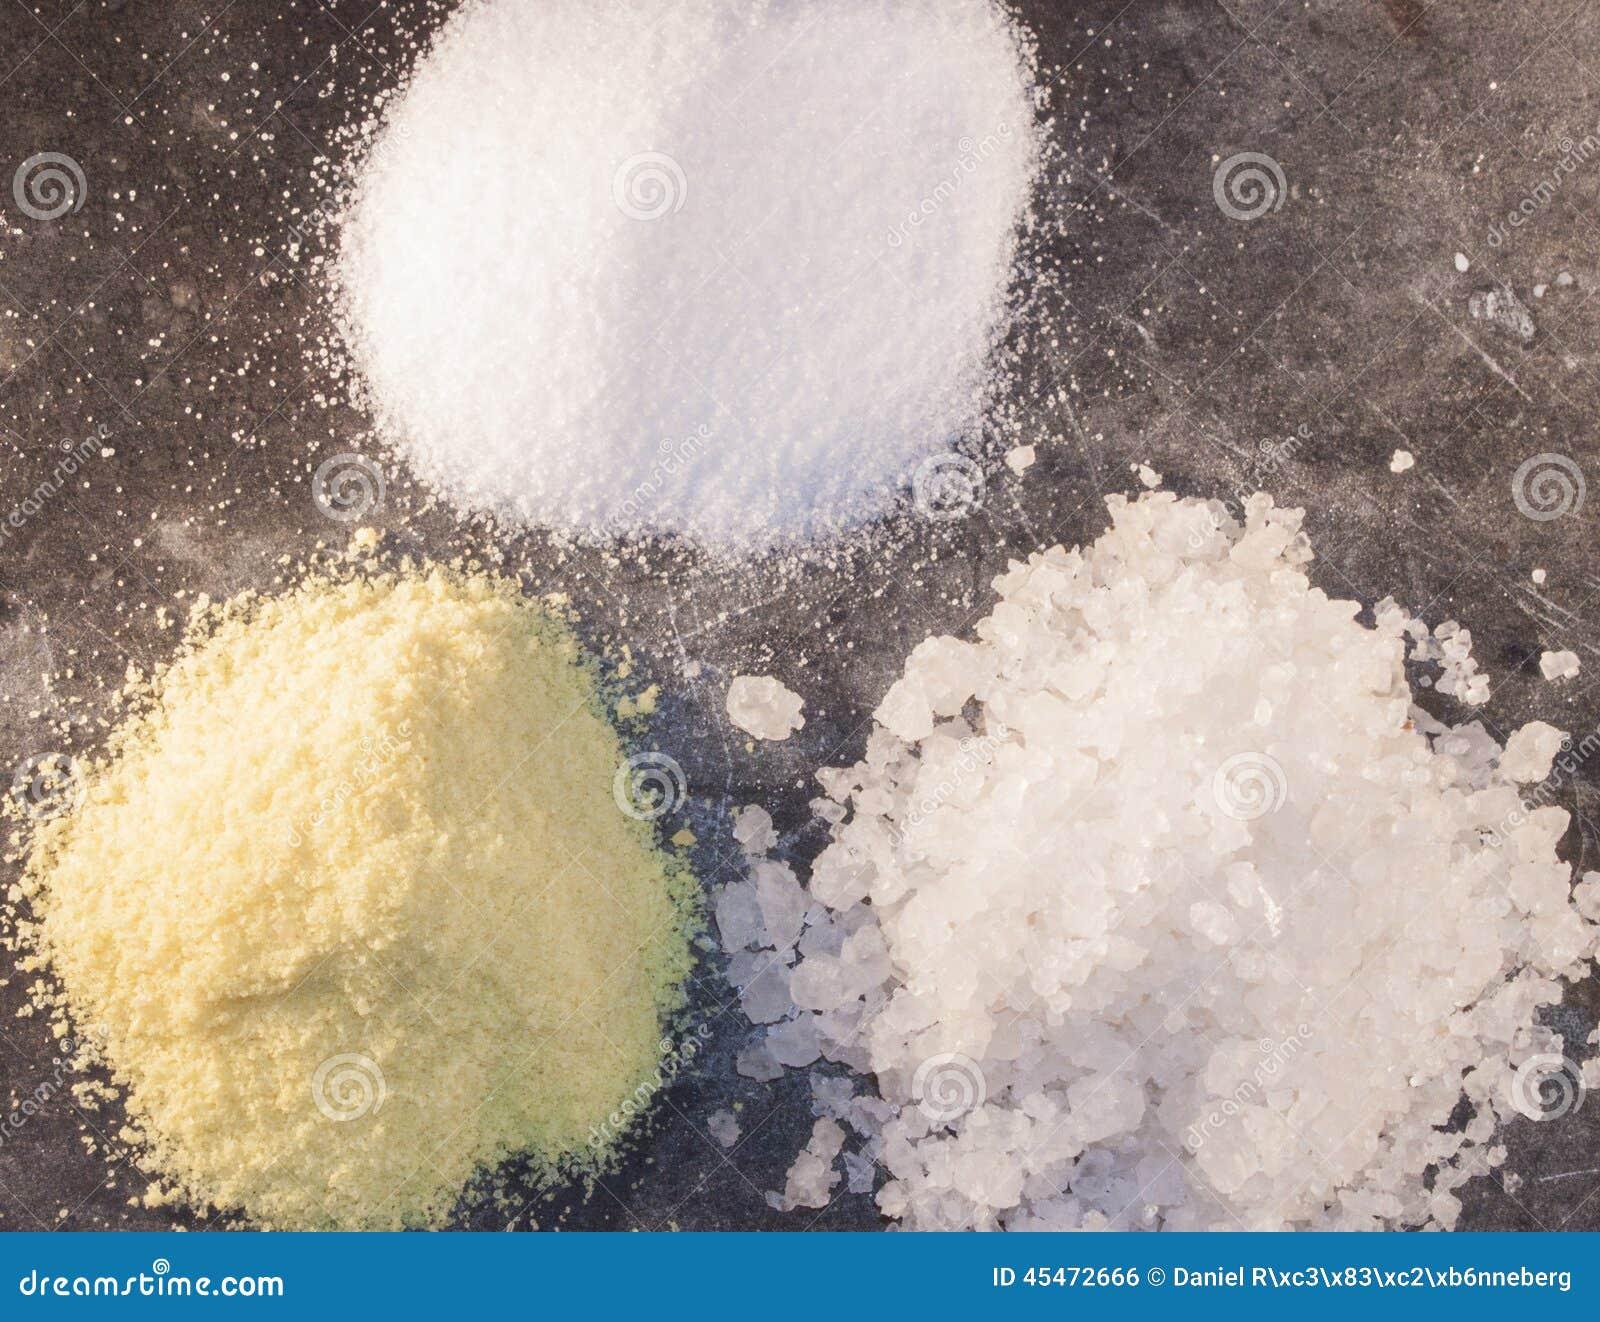 Aroma Rock And Ordinary Salt Stock Photo Image Of Sodium